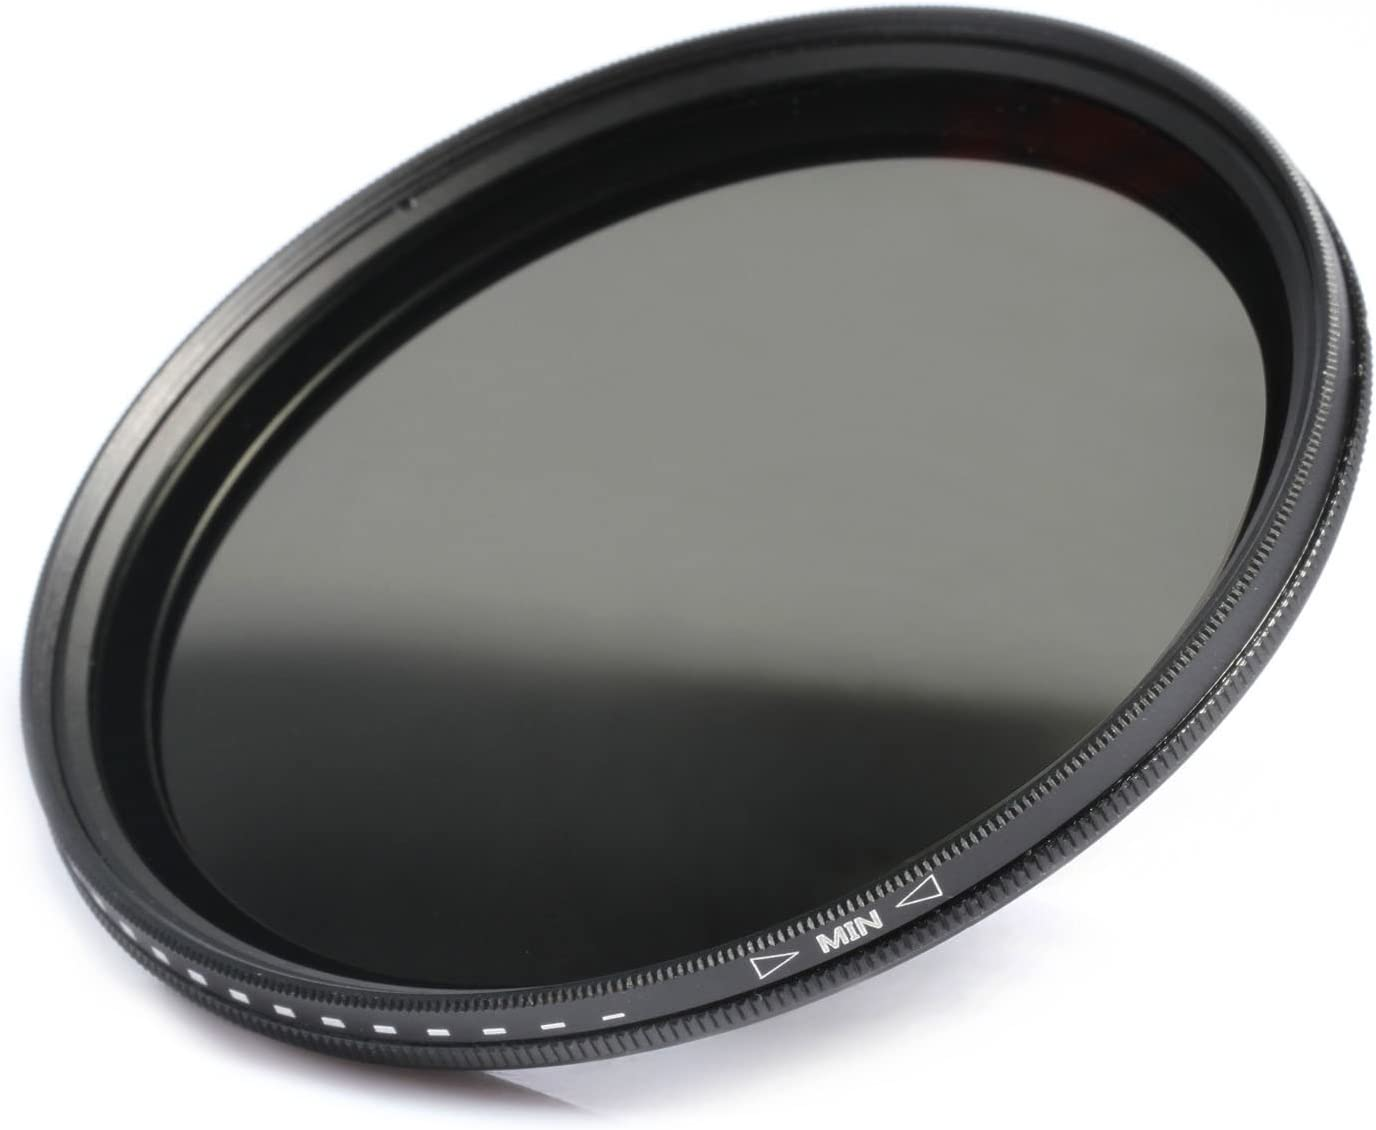 K/&F Concept 43mm Slim Fader Variable ND2-ND400 Neutral Density Adjustable ND ND2 ND4 ND8 ND16 to ND400 Lens Filter Kit Microfiber Cleaning Cloth for DSLR Cameras